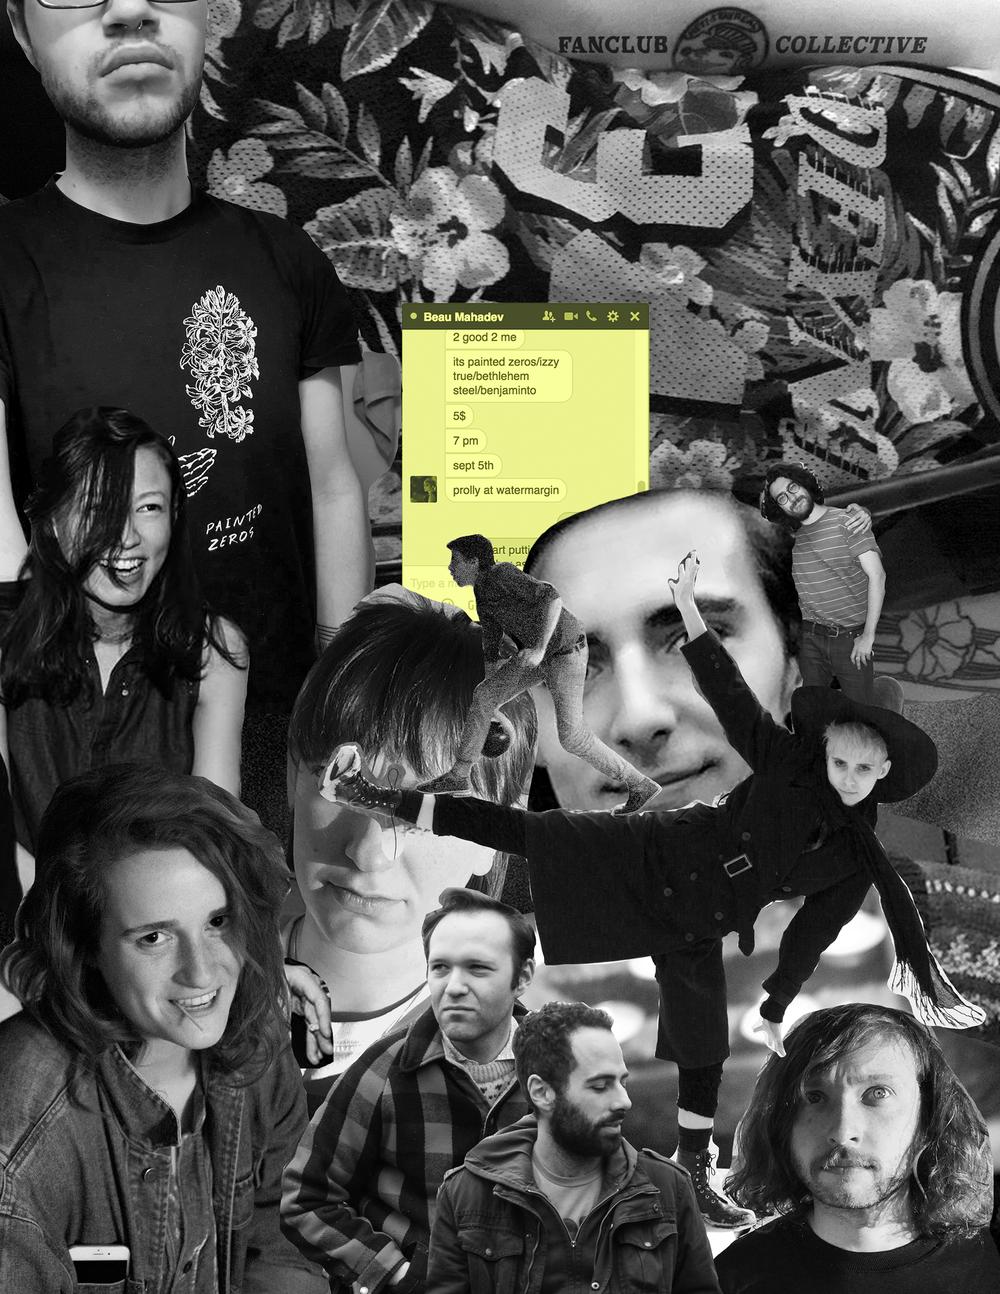 Original photos by Izabeau Giannakopoulos,Becca Ryskalczyk, and Benjamin Torrey. Poster for Fanclub Collective. 2016.